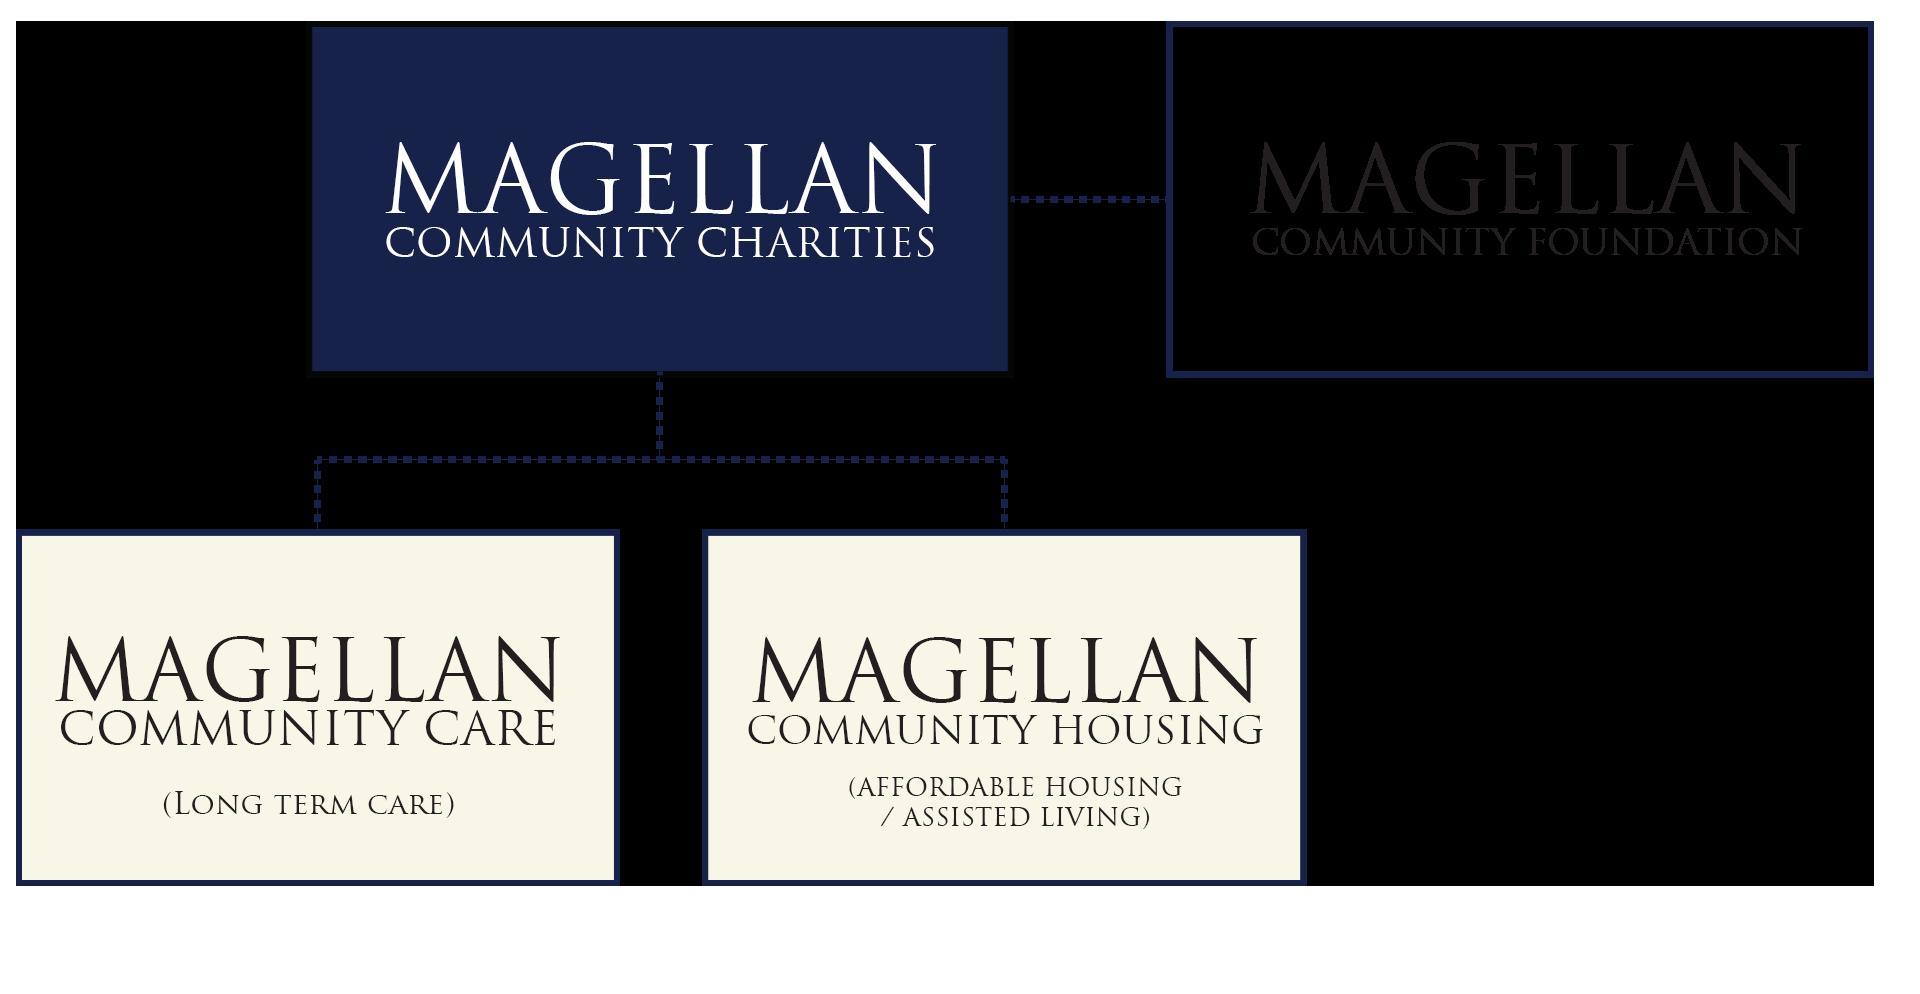 Organizational Structure - Magellan